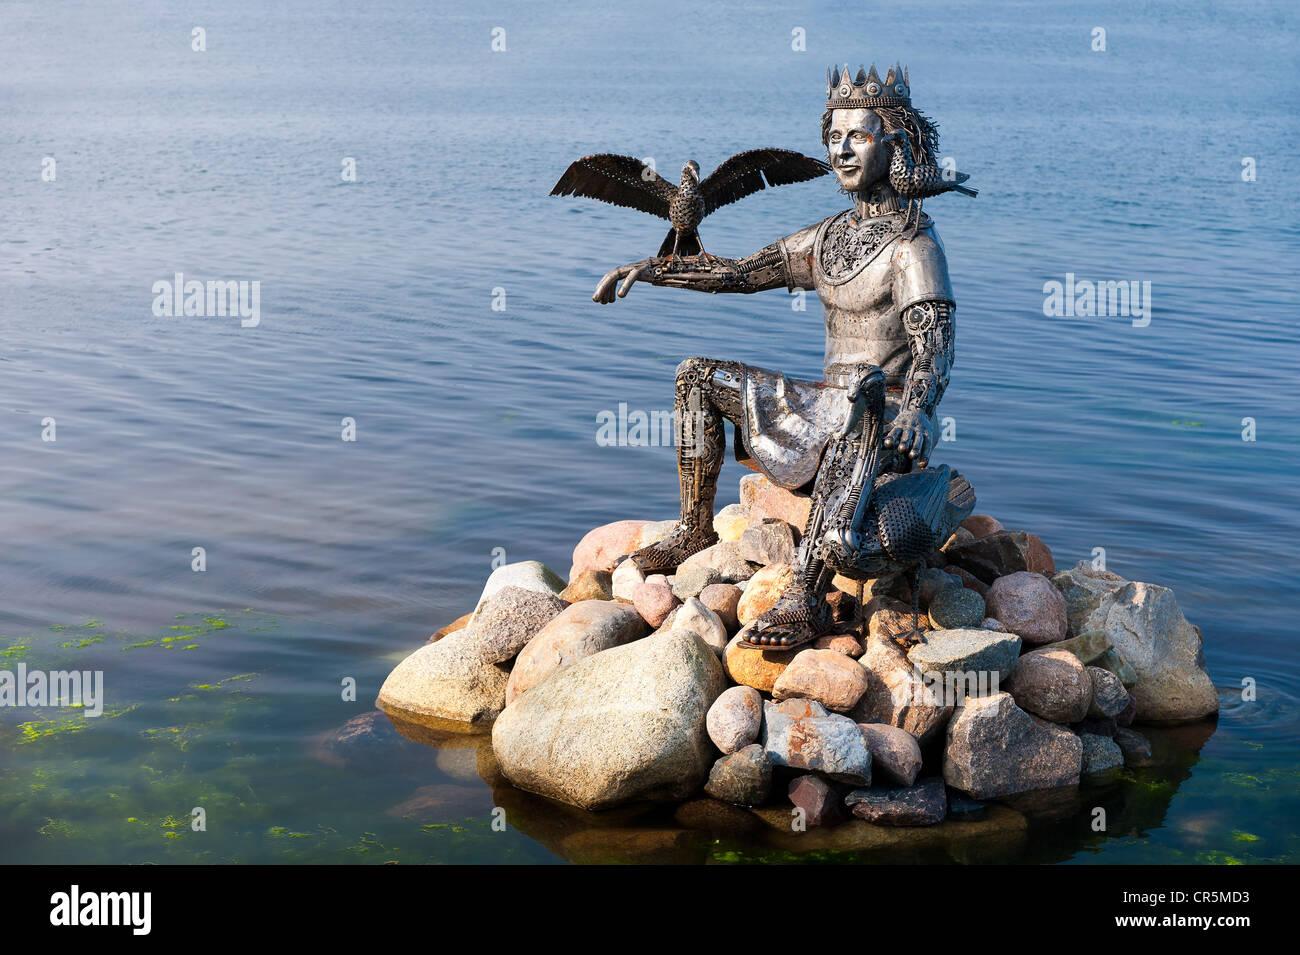 Norse God Njord, sculpture in Heiligenhafen, Schleswig-Holstein, Germany, Europe - Stock Image